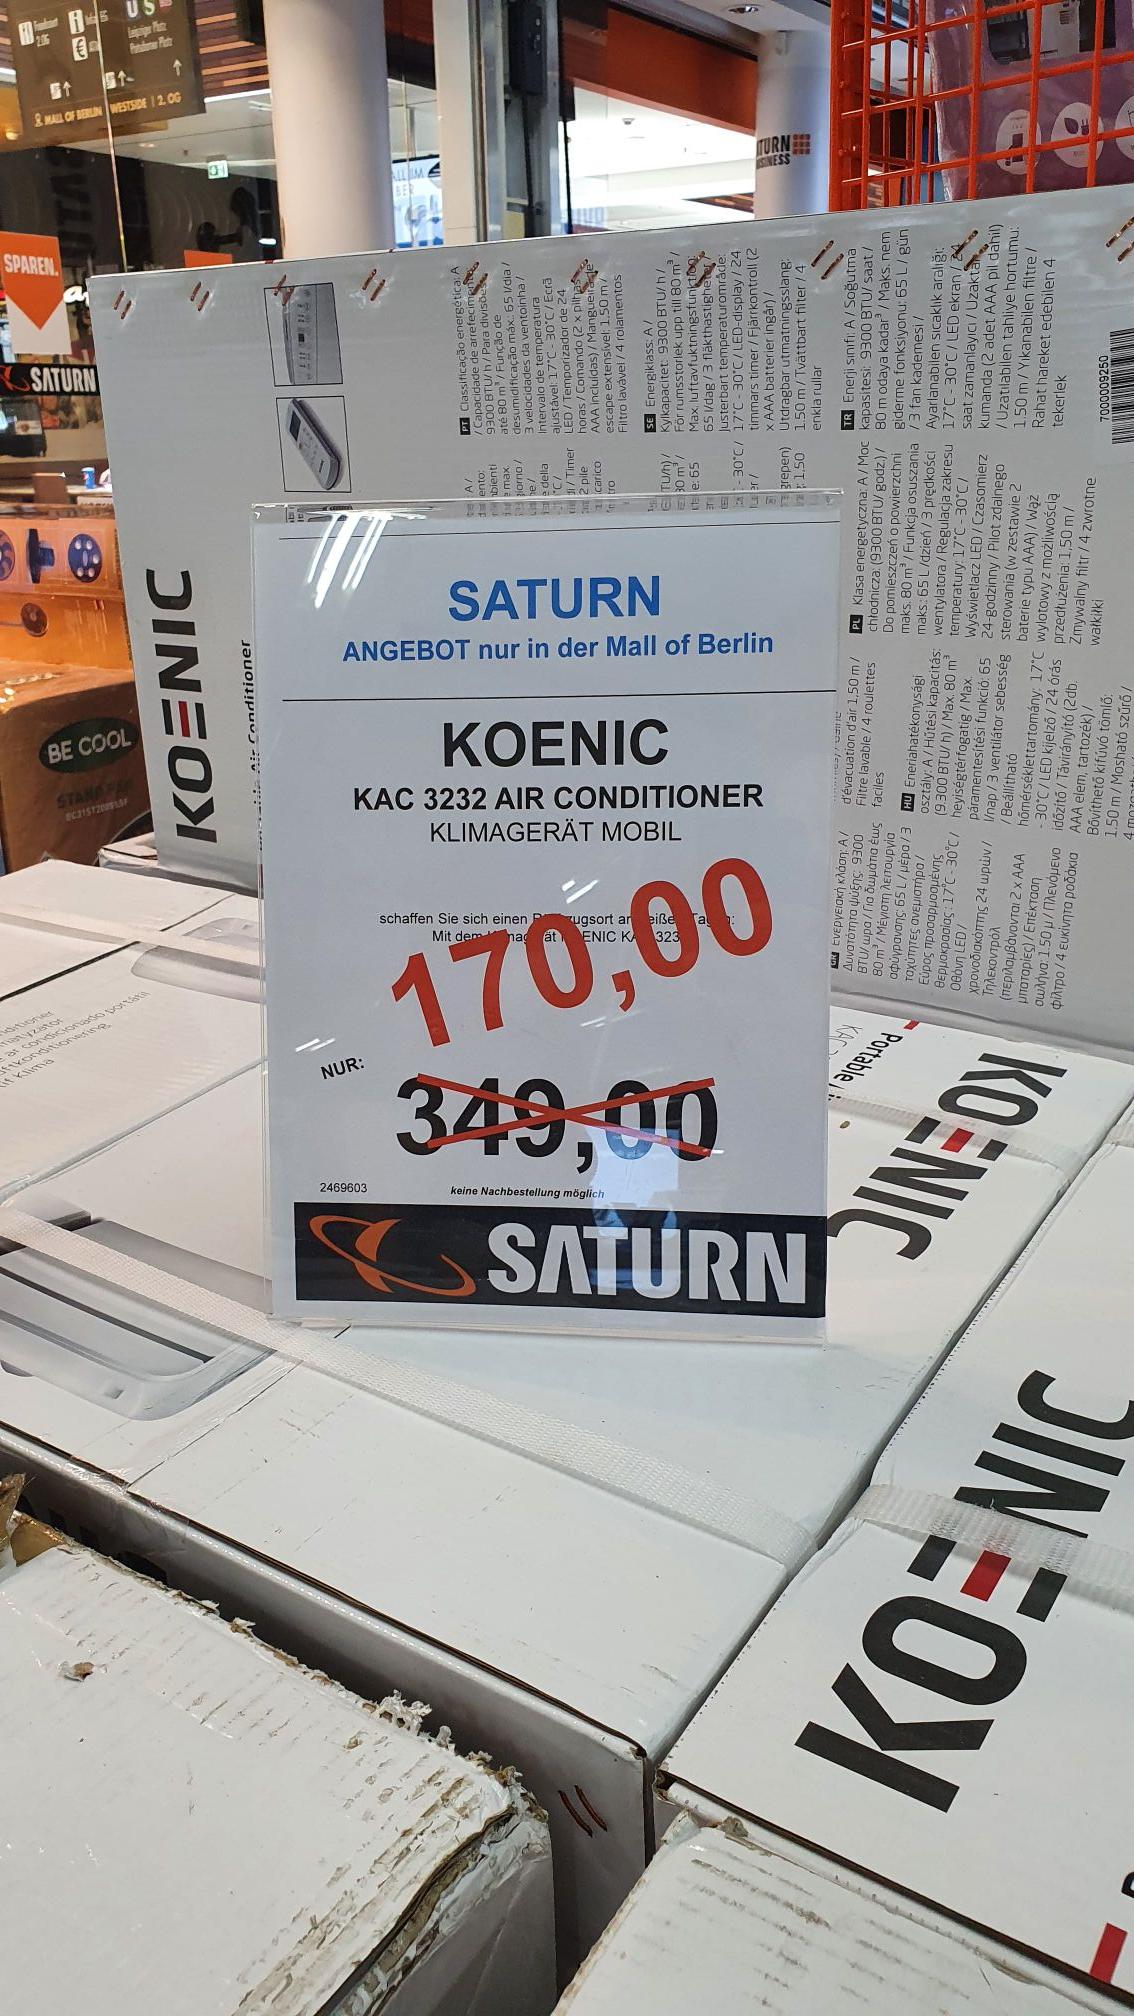 [Berlin Saturn LP 12/ Sammeldeal] Koenic Kac 3232 Klimagerät/ Sodastream Crystal 2.0/ Aarke Carbonator 2/ Remington HC 5018 Haarschneider